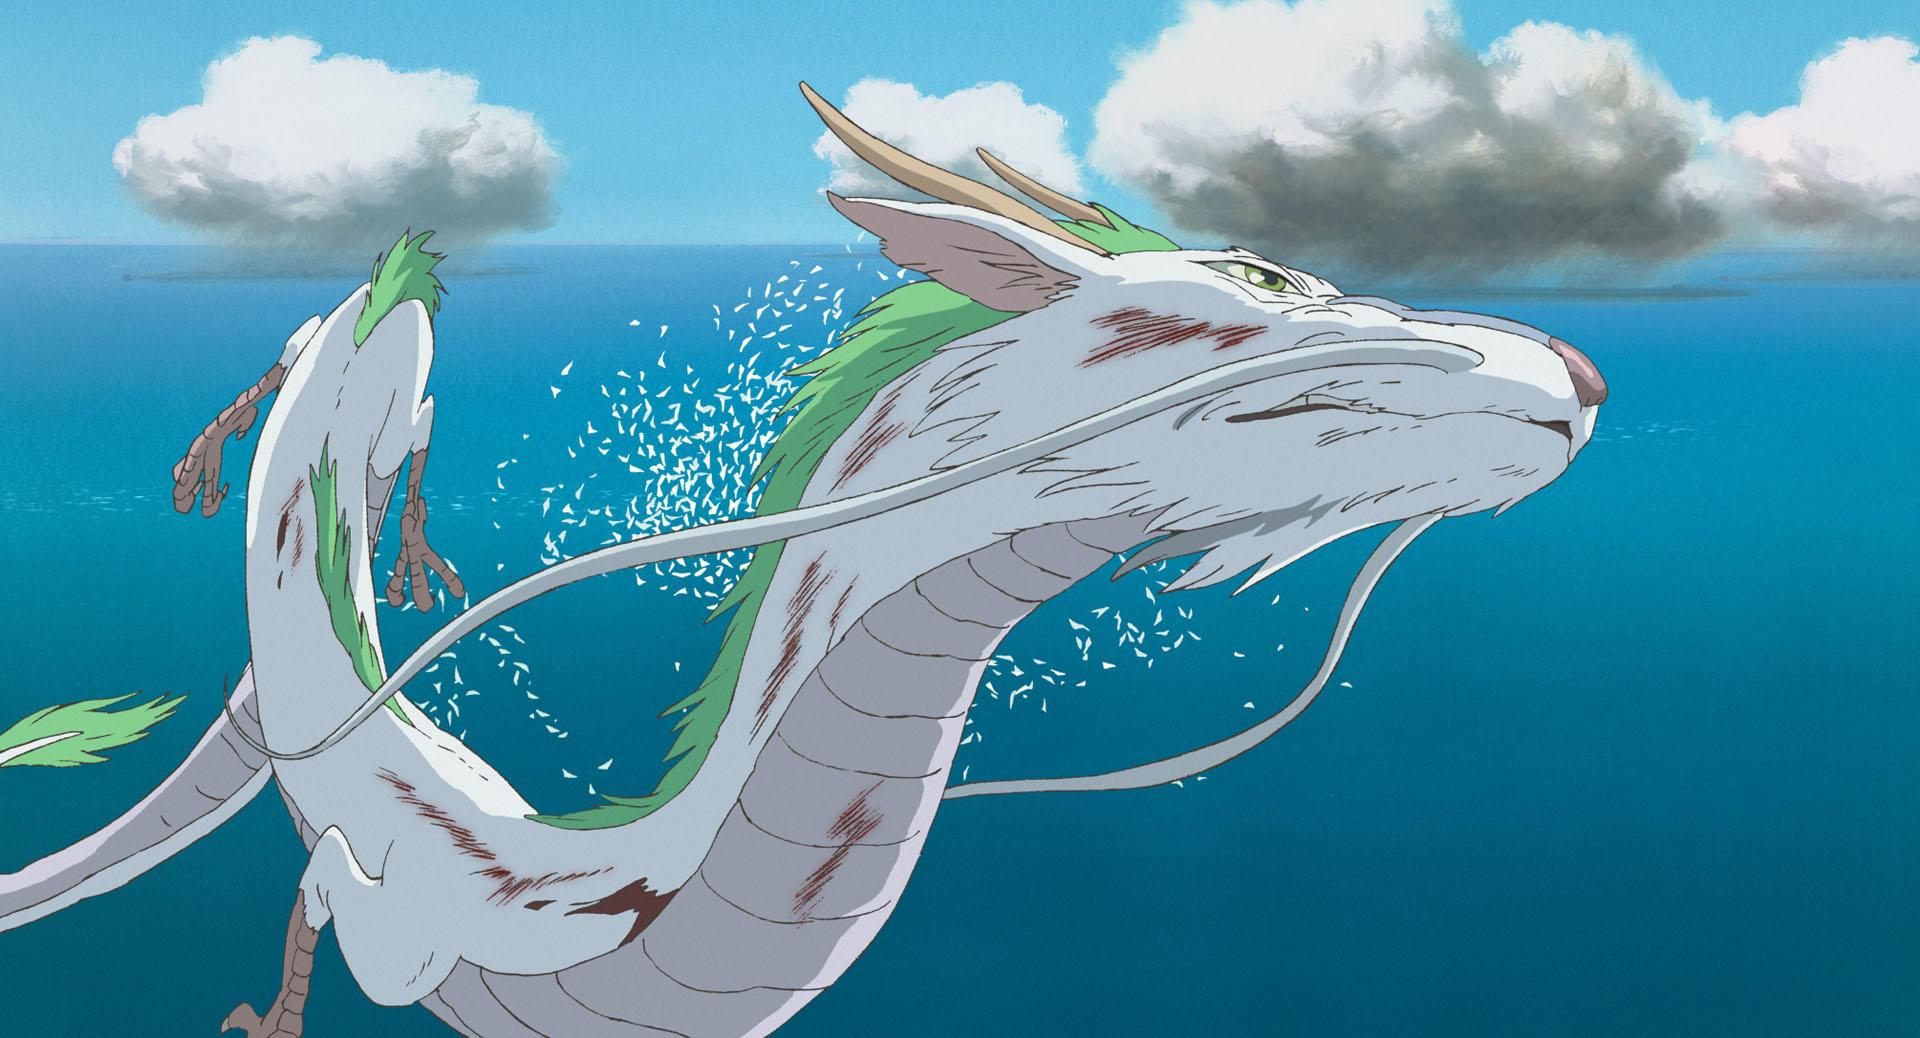 🥰 Studija Ghibli vypustyť artbuk z robotamy Hajao Mijadzaki